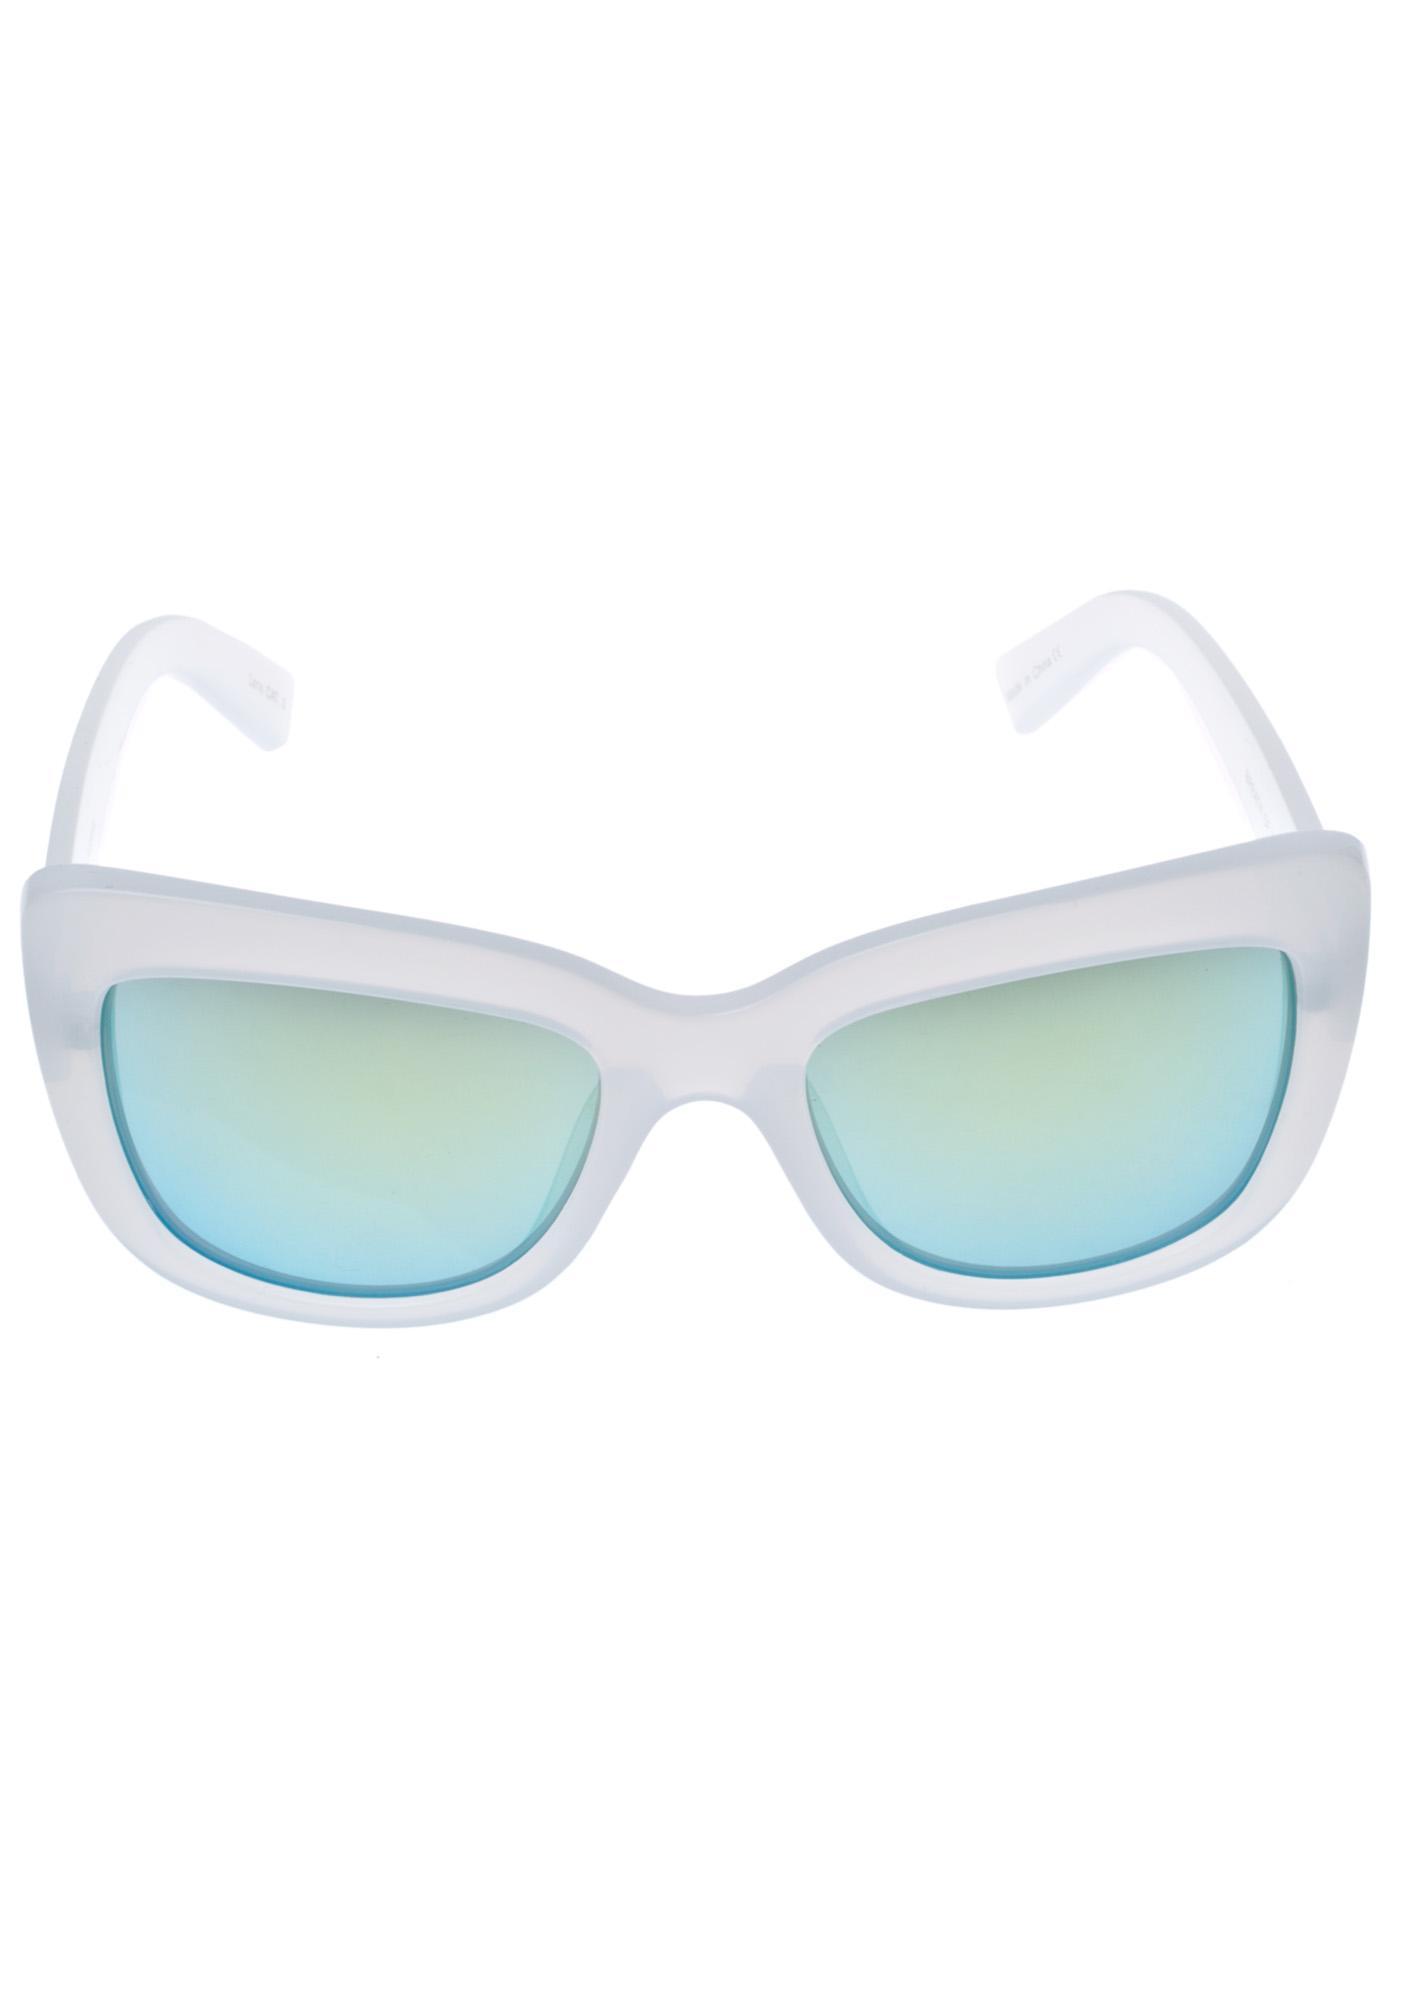 Quay Eyeware Breath Of Life Sunglasses